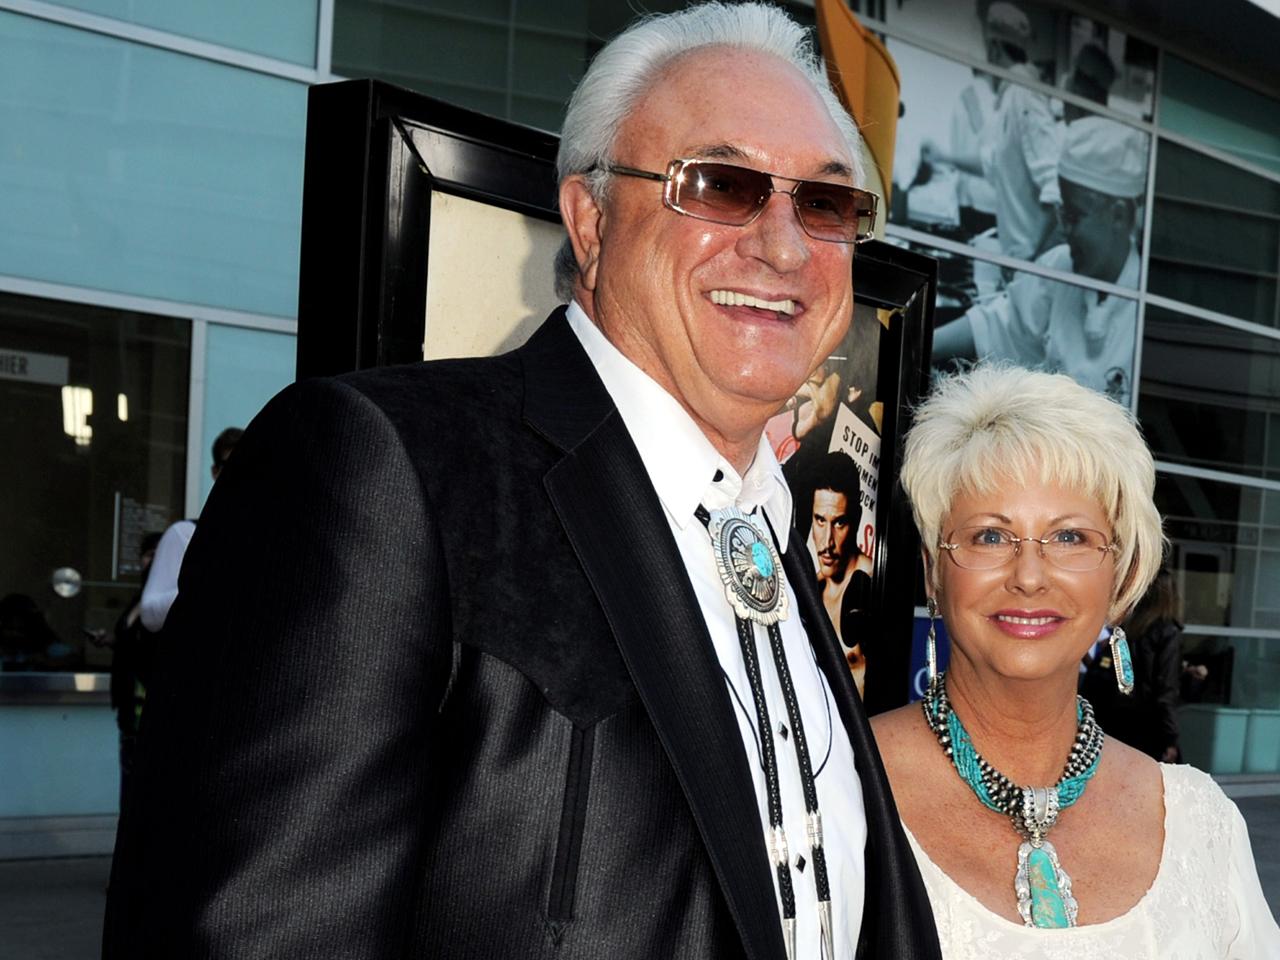 Mustang Ranch Brothel Owner Lance Gilman Enters Public